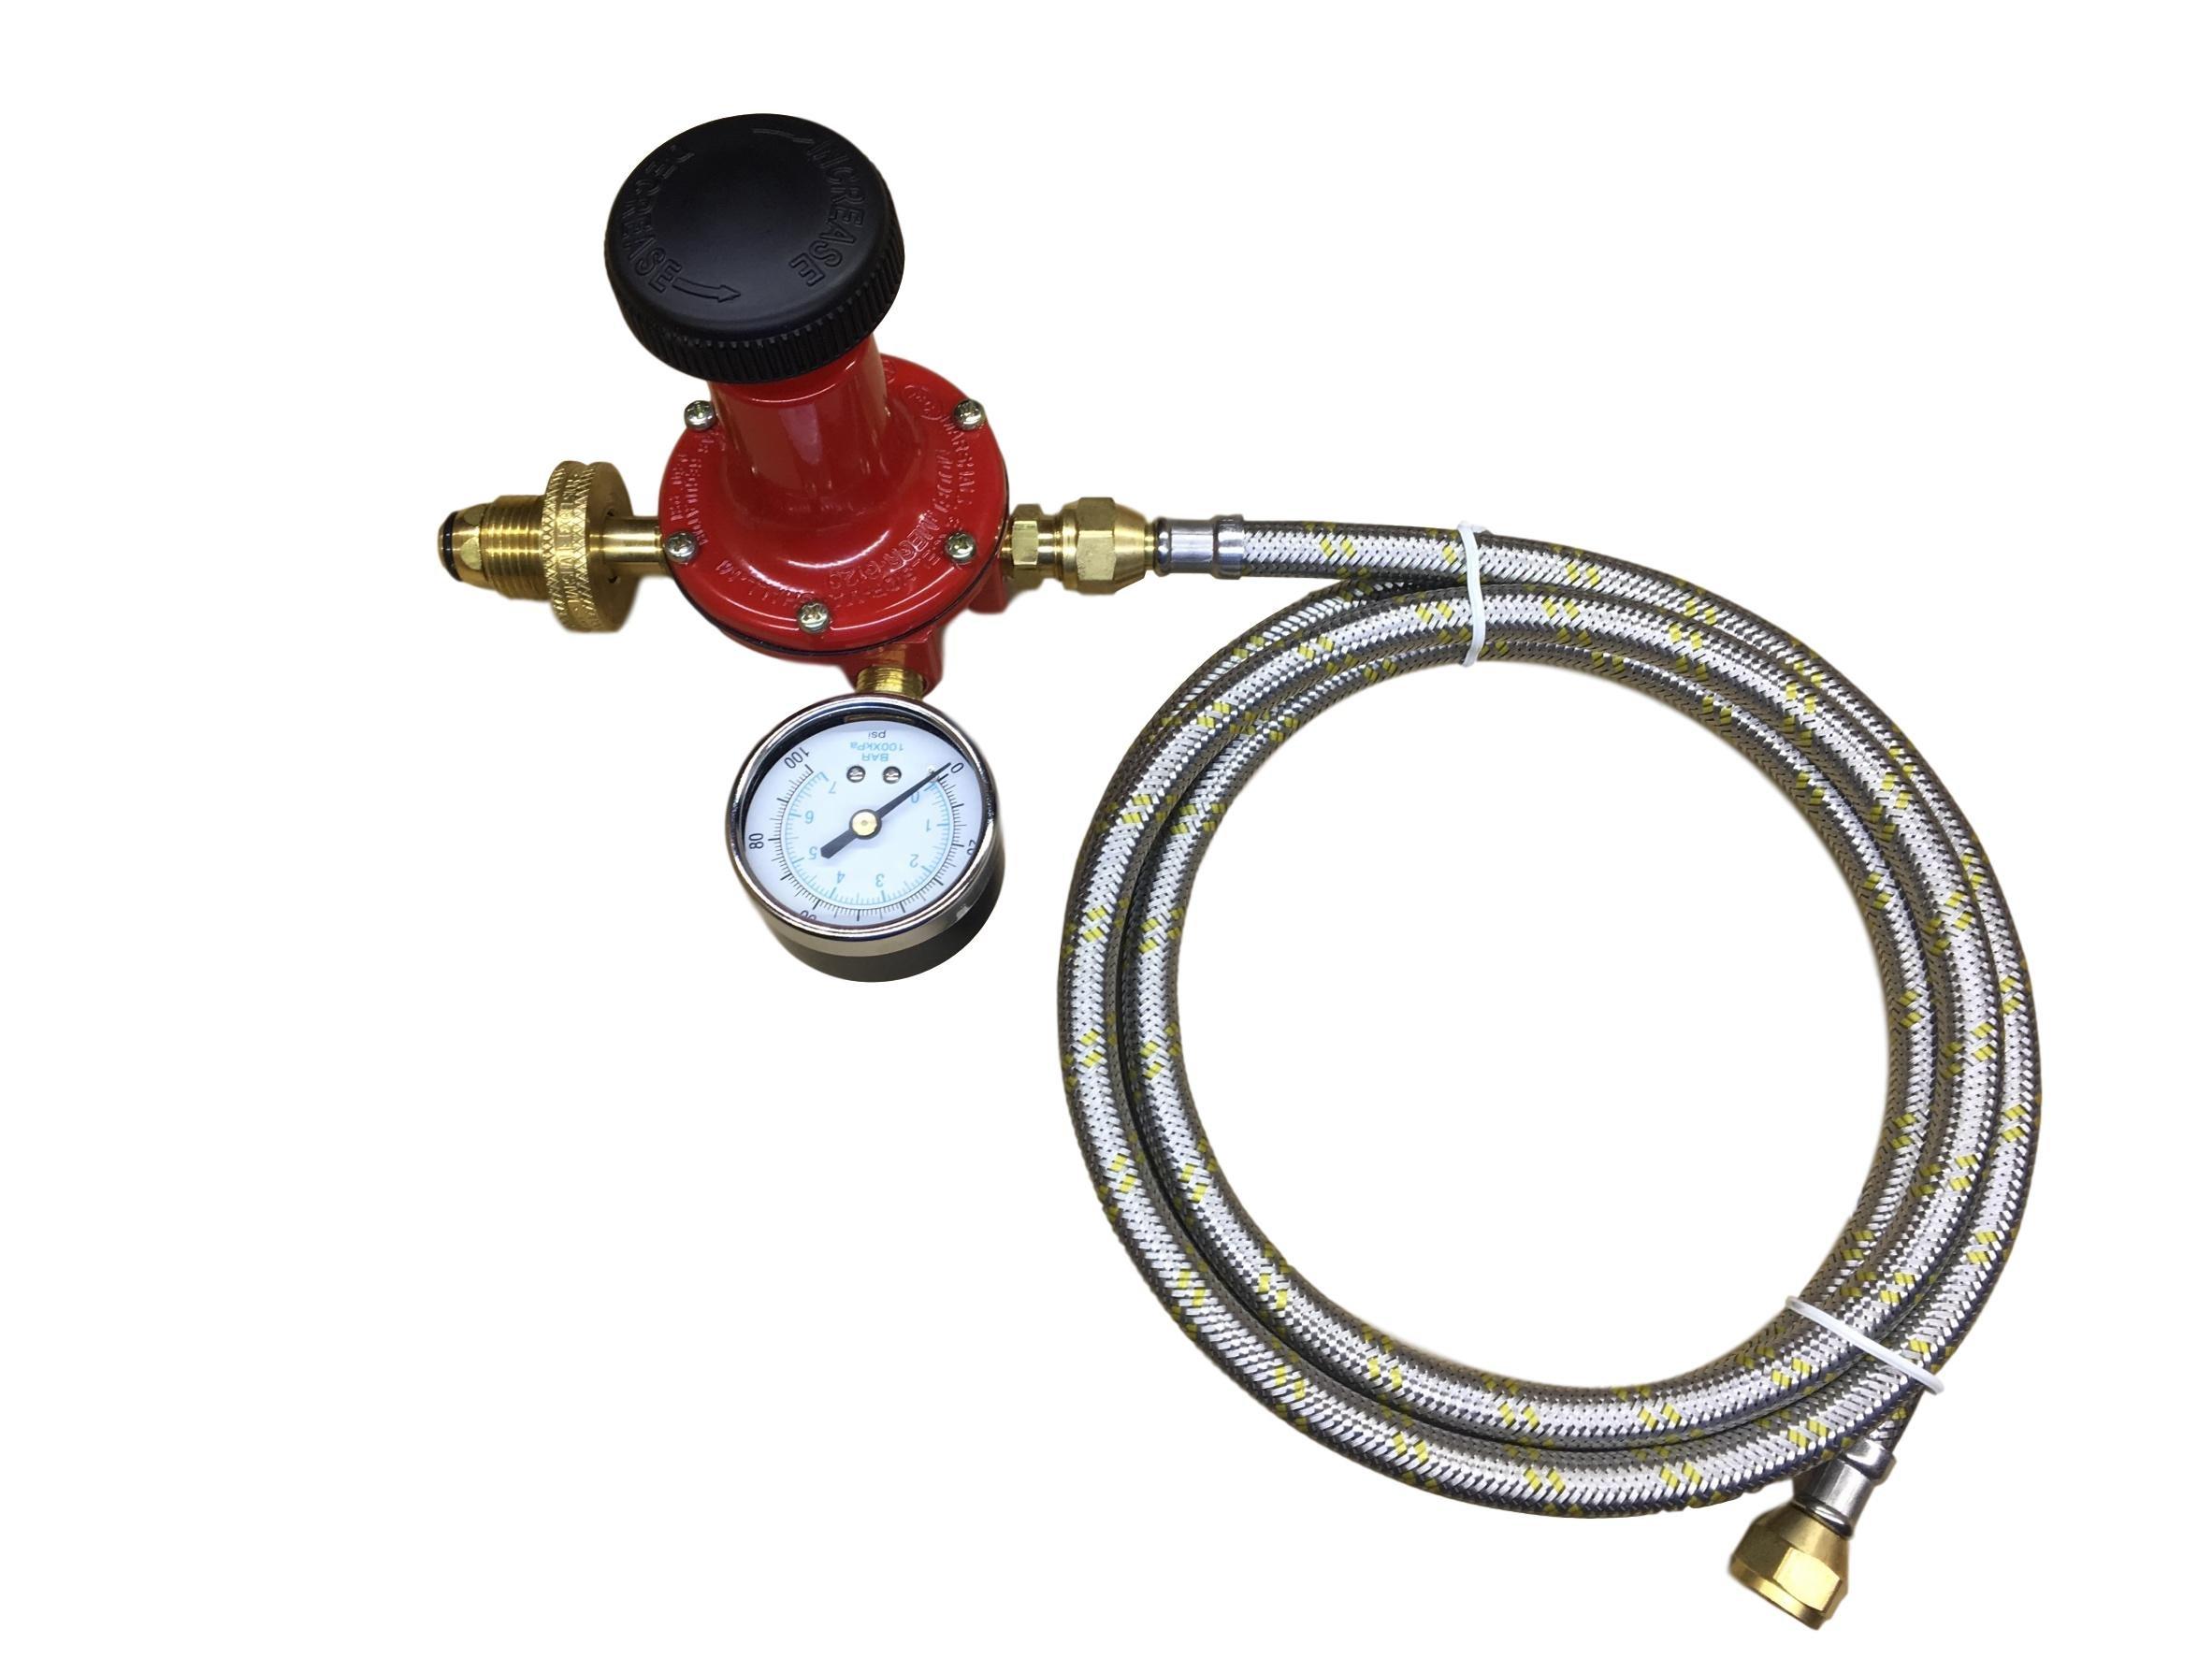 Propane LP Gas Adjustable 0-100psi High Pressure Regulator Soft Nose POL Brass Wheel Connector, Gauge and 12ft Stainless Steel Braided Hose